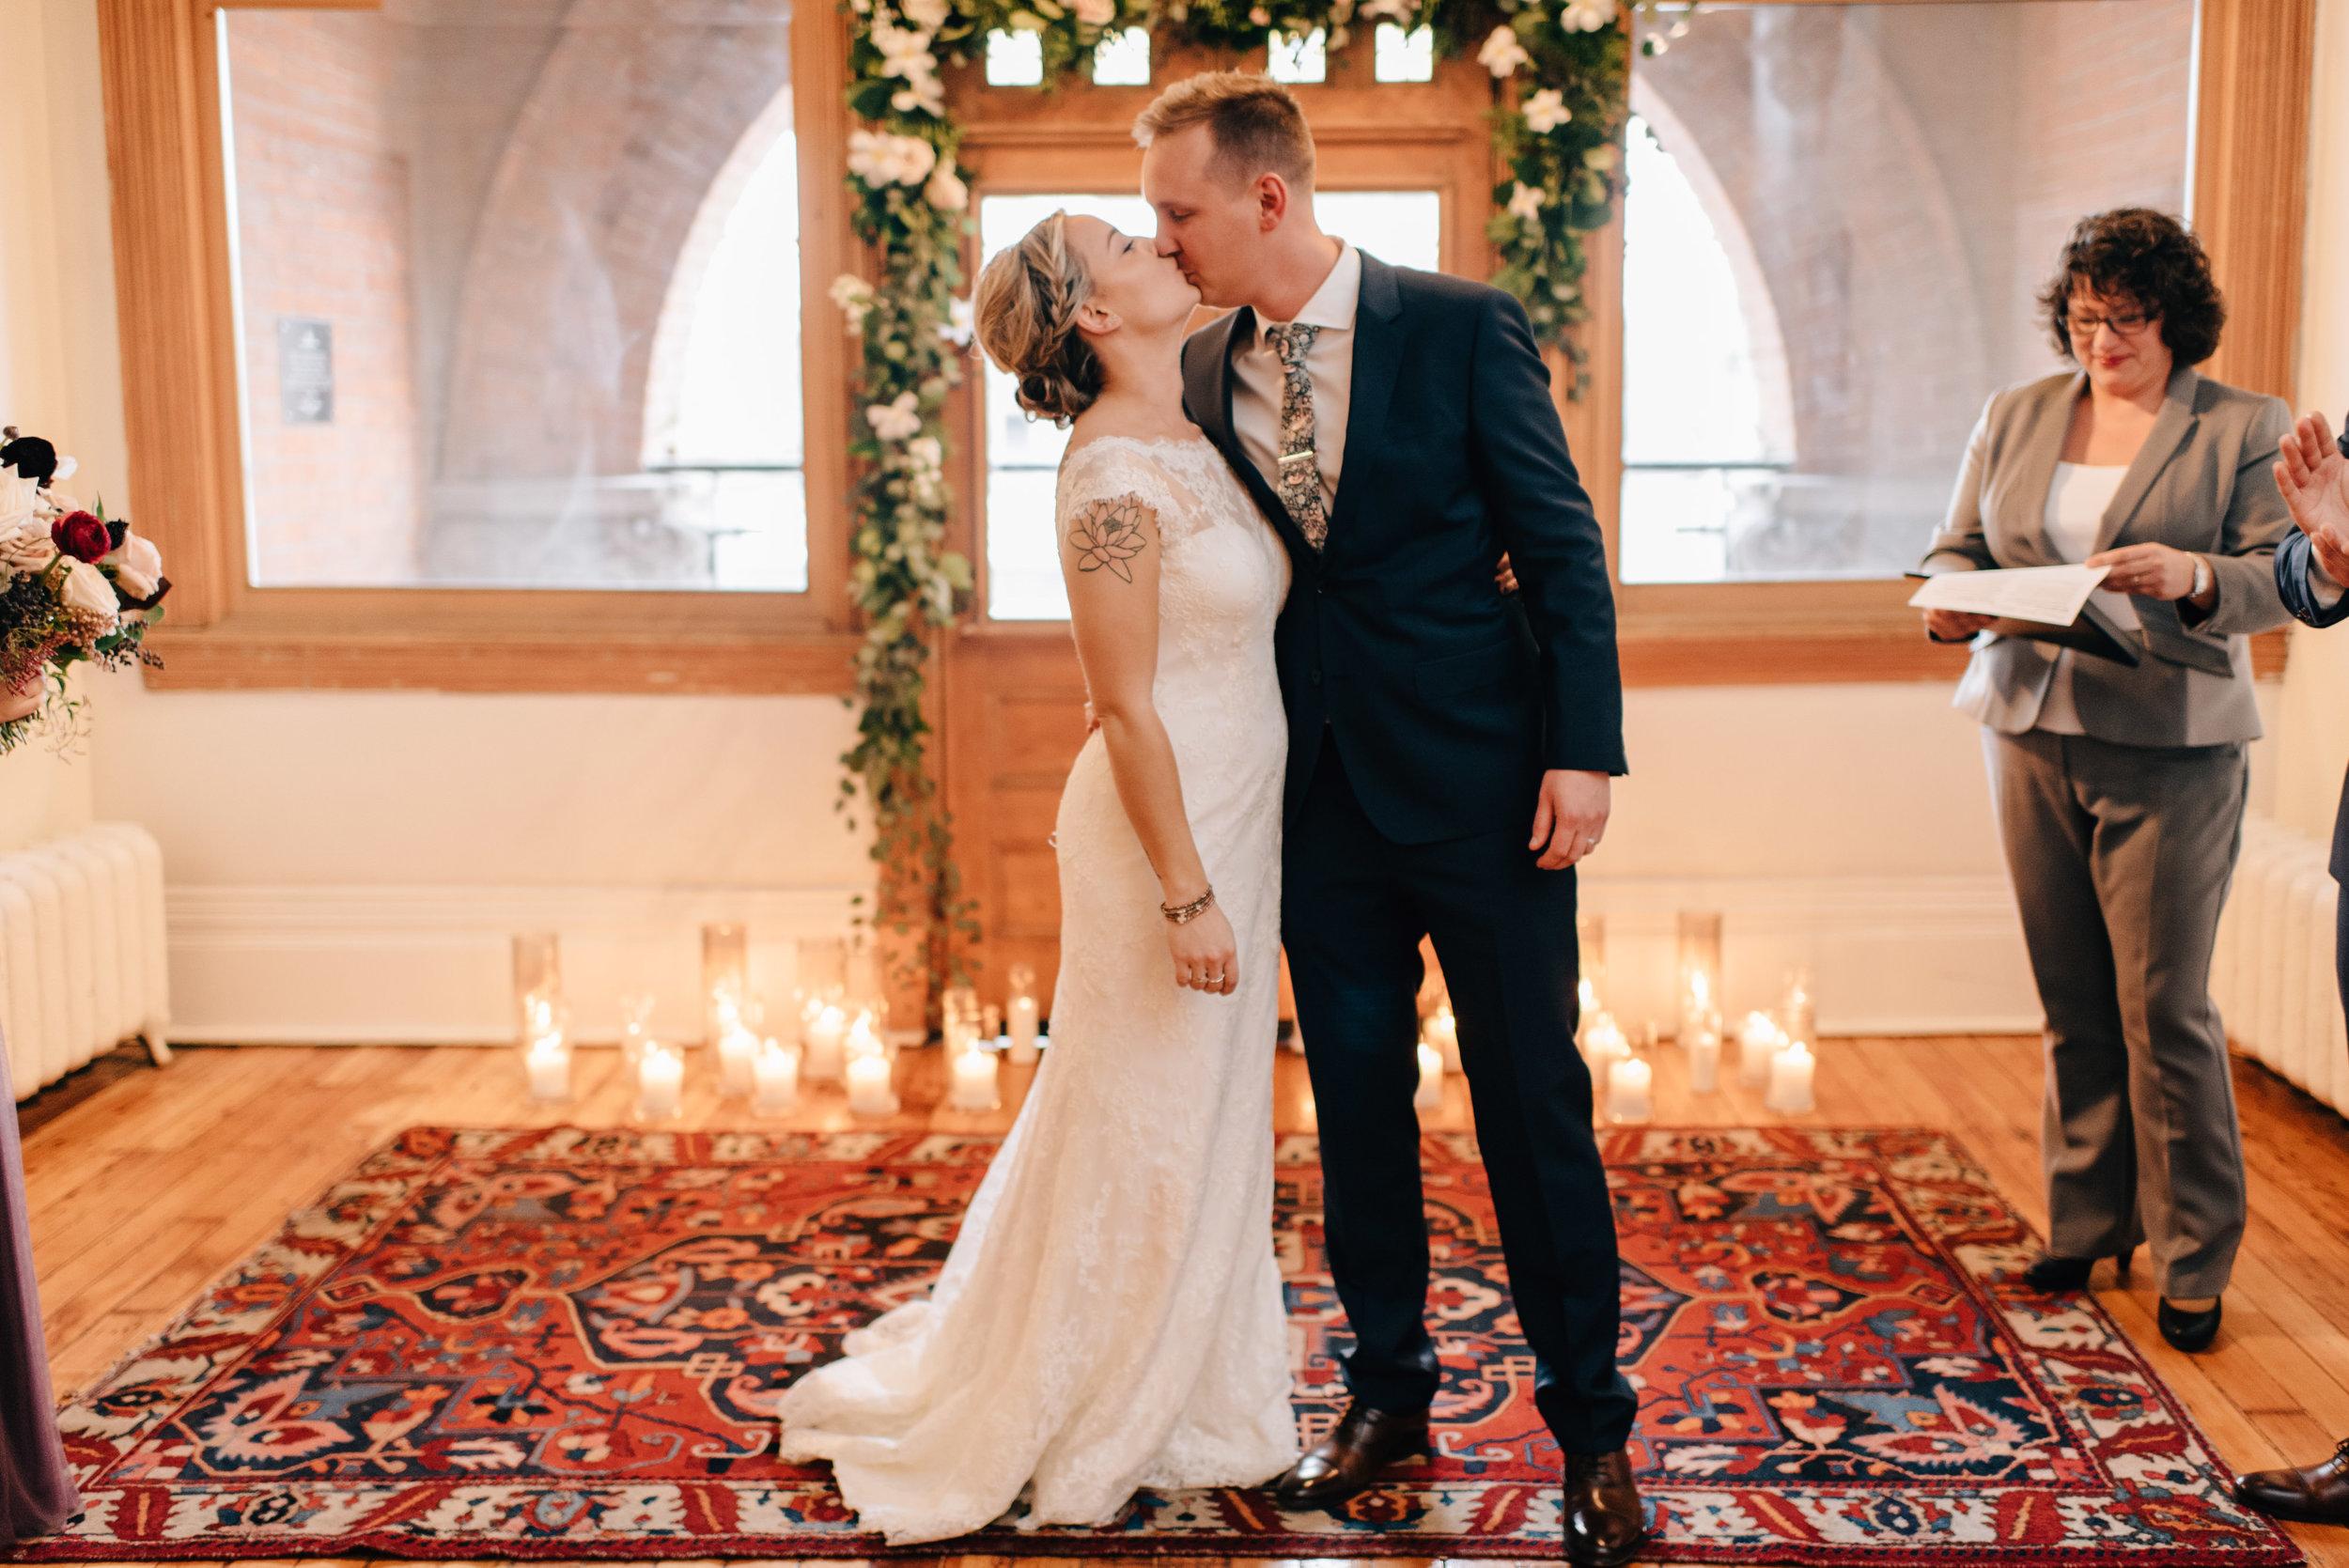 Intimate Gladstone Hotel wedding ceremony - Sara Monika Photographer